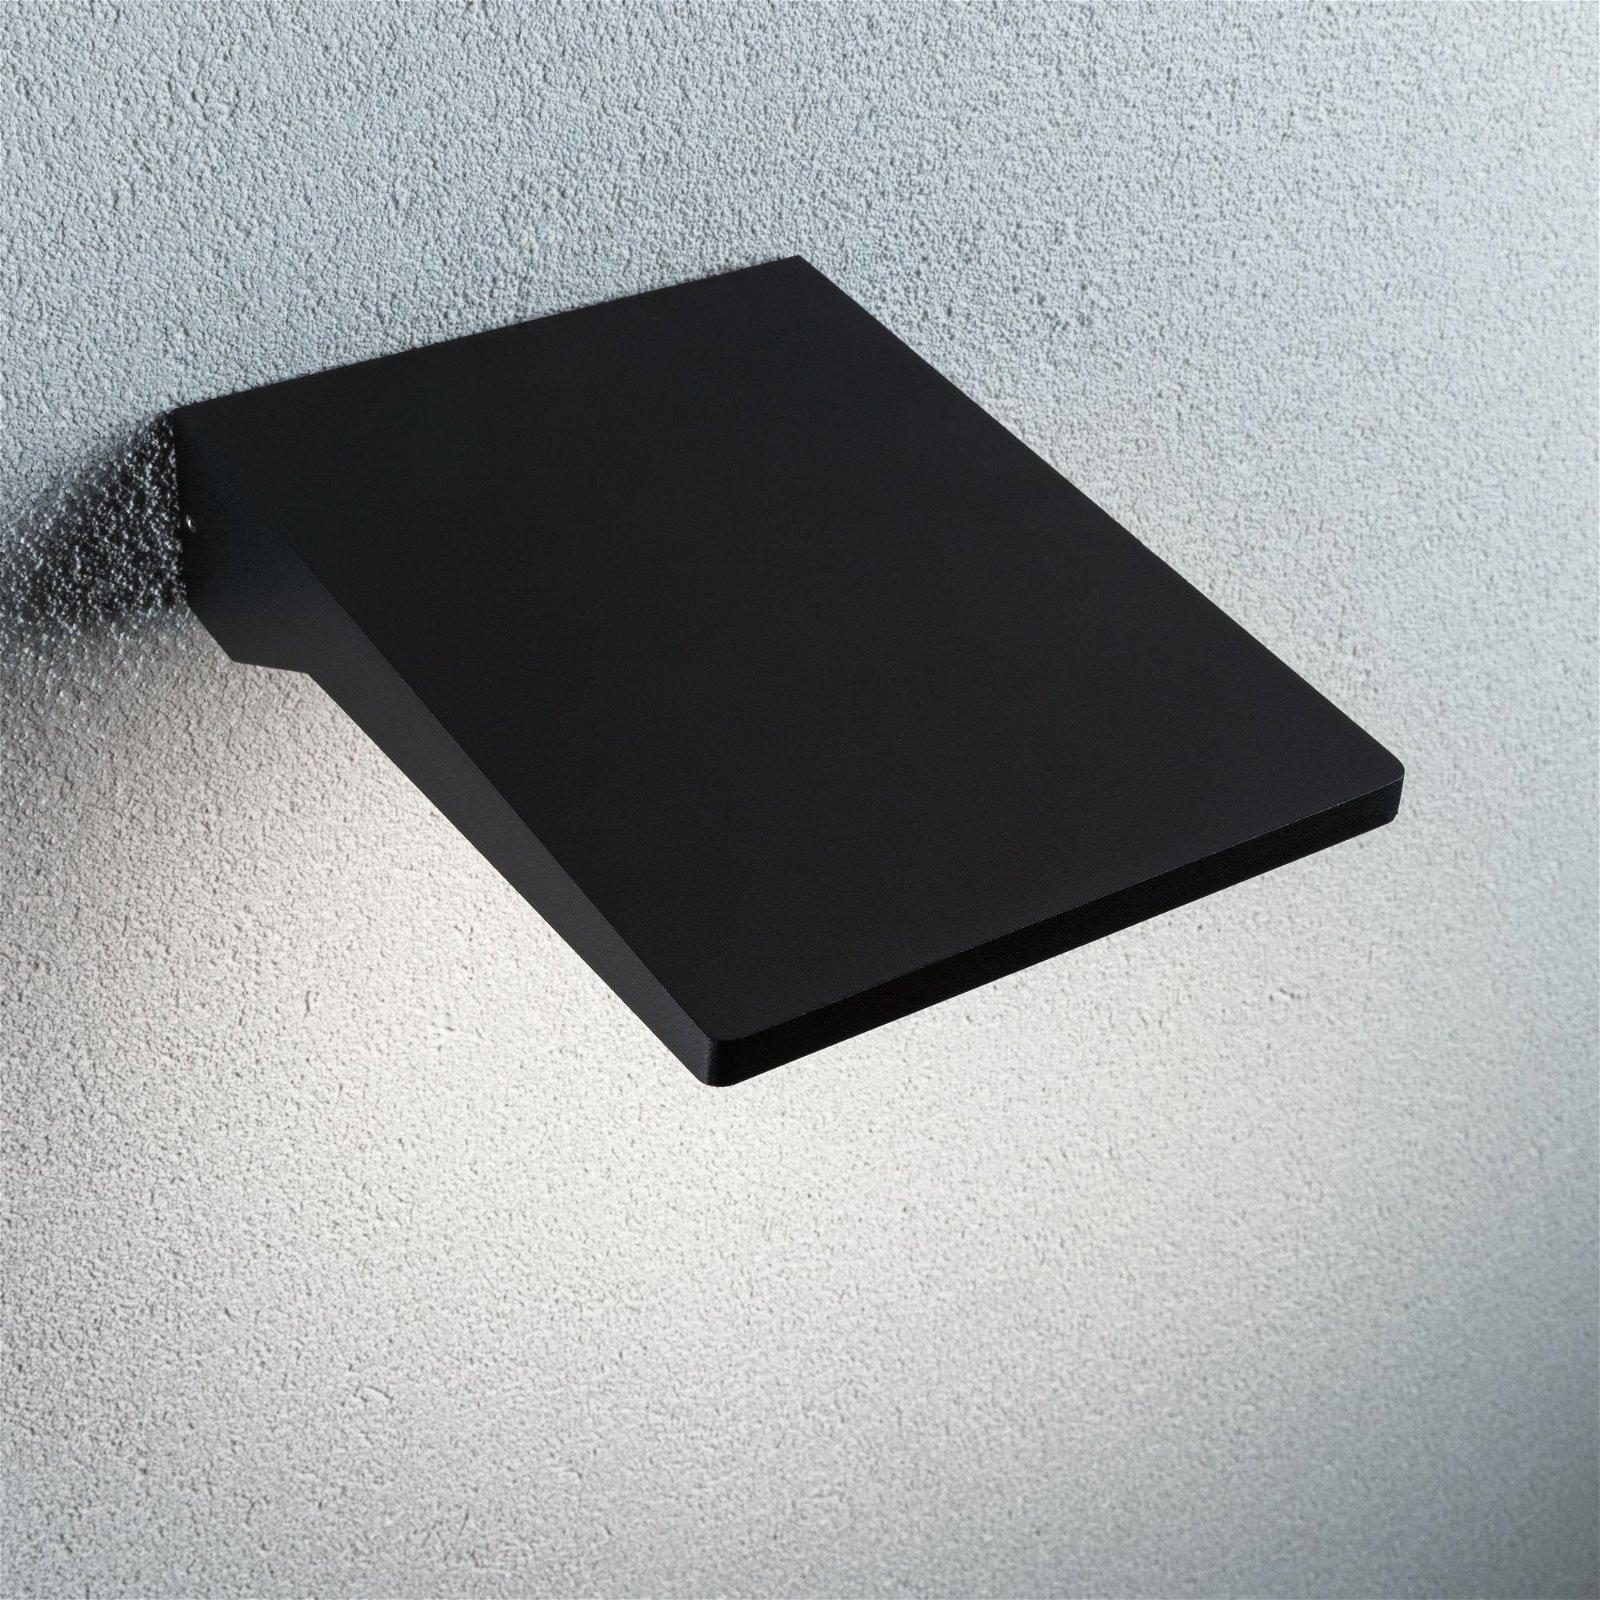 LED Außenwandleuchte Ronea Bewegungsmelder IP44 180x250mm 3000K 10,3W 1200lm 230V Dunkelgrau Aluminium